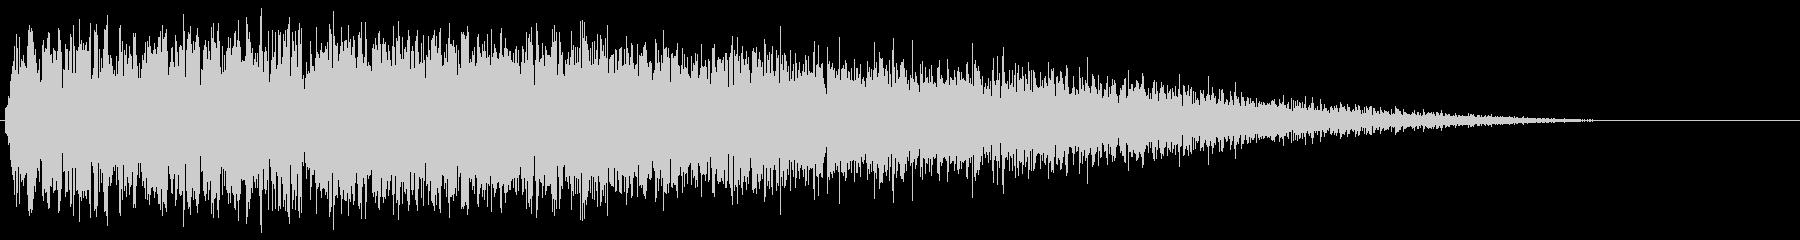 SynthSweep EC03_34_2の未再生の波形